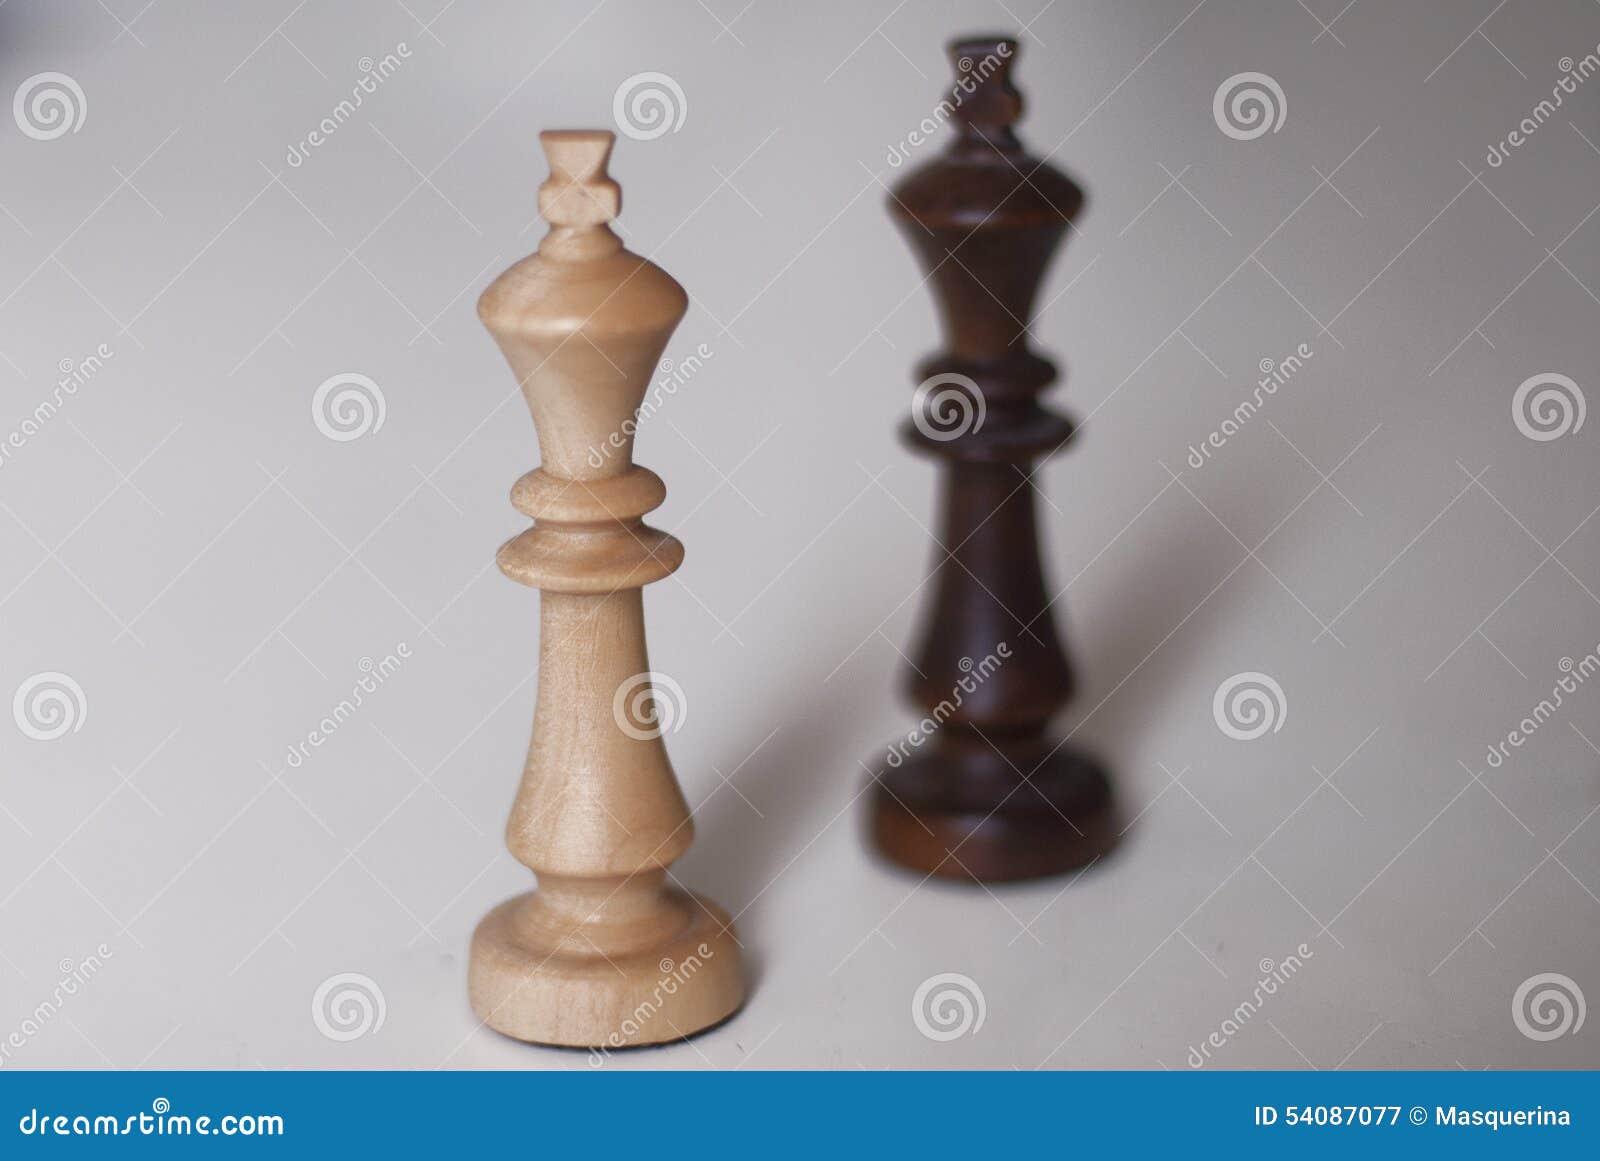 Zwart-witte schaakkoningen